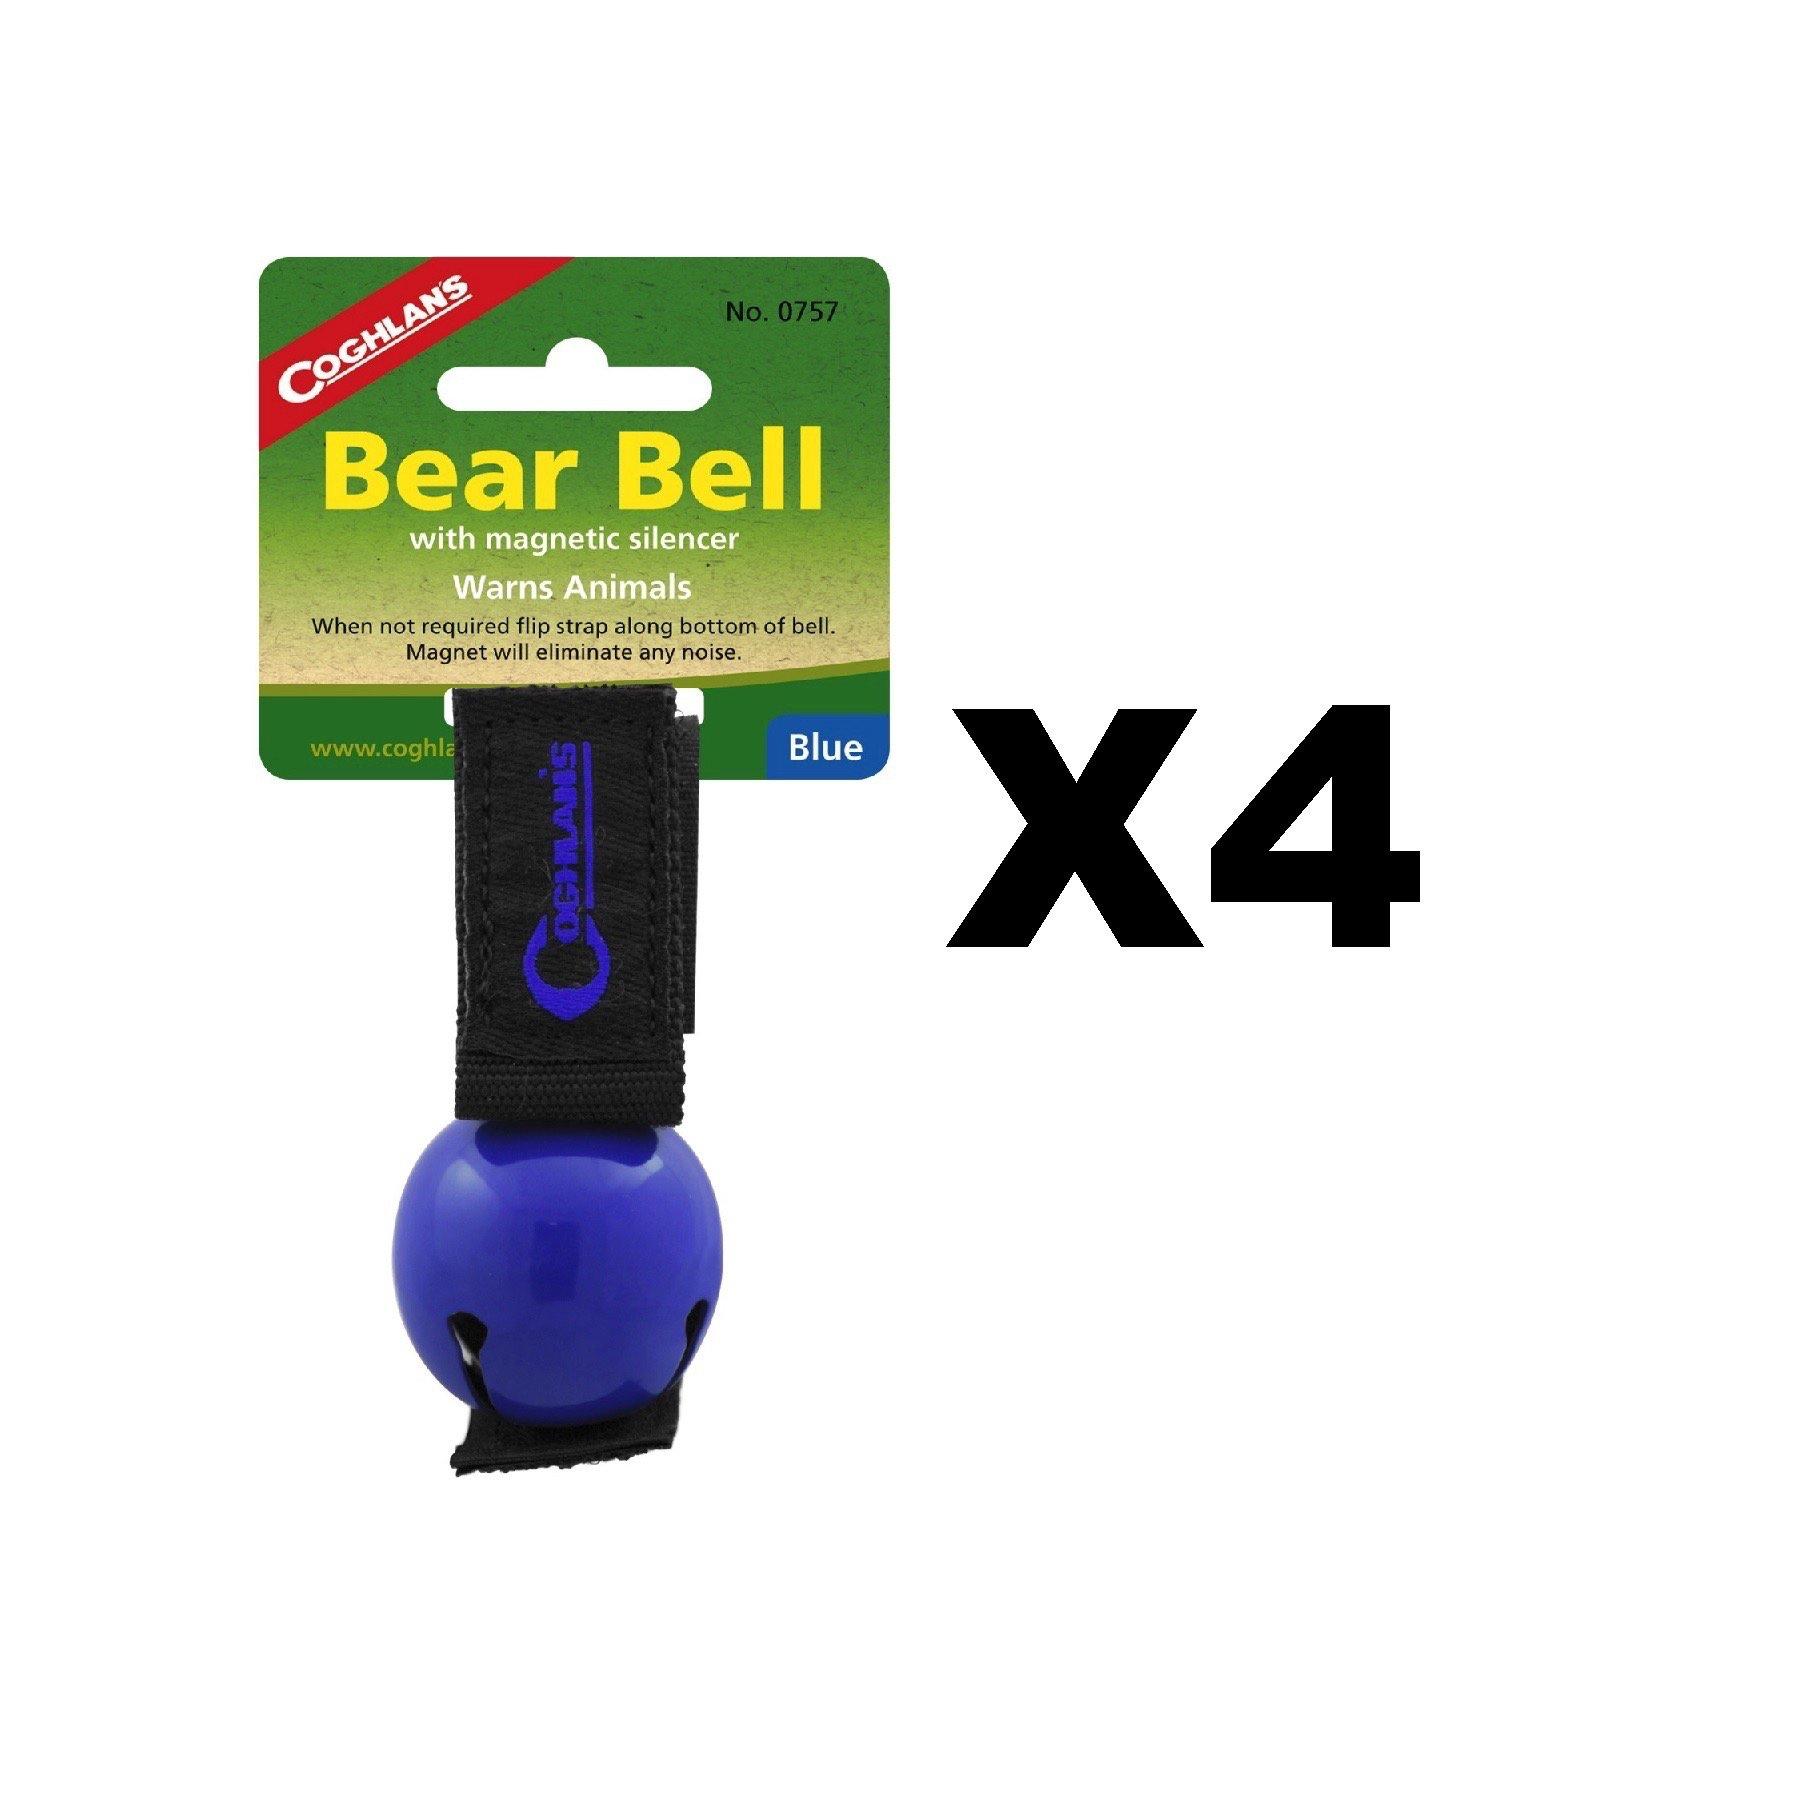 Coghlan's Bear Bell Blue w/Magnetic Silencer & Loop Strap Warns Animals (4-Pack)